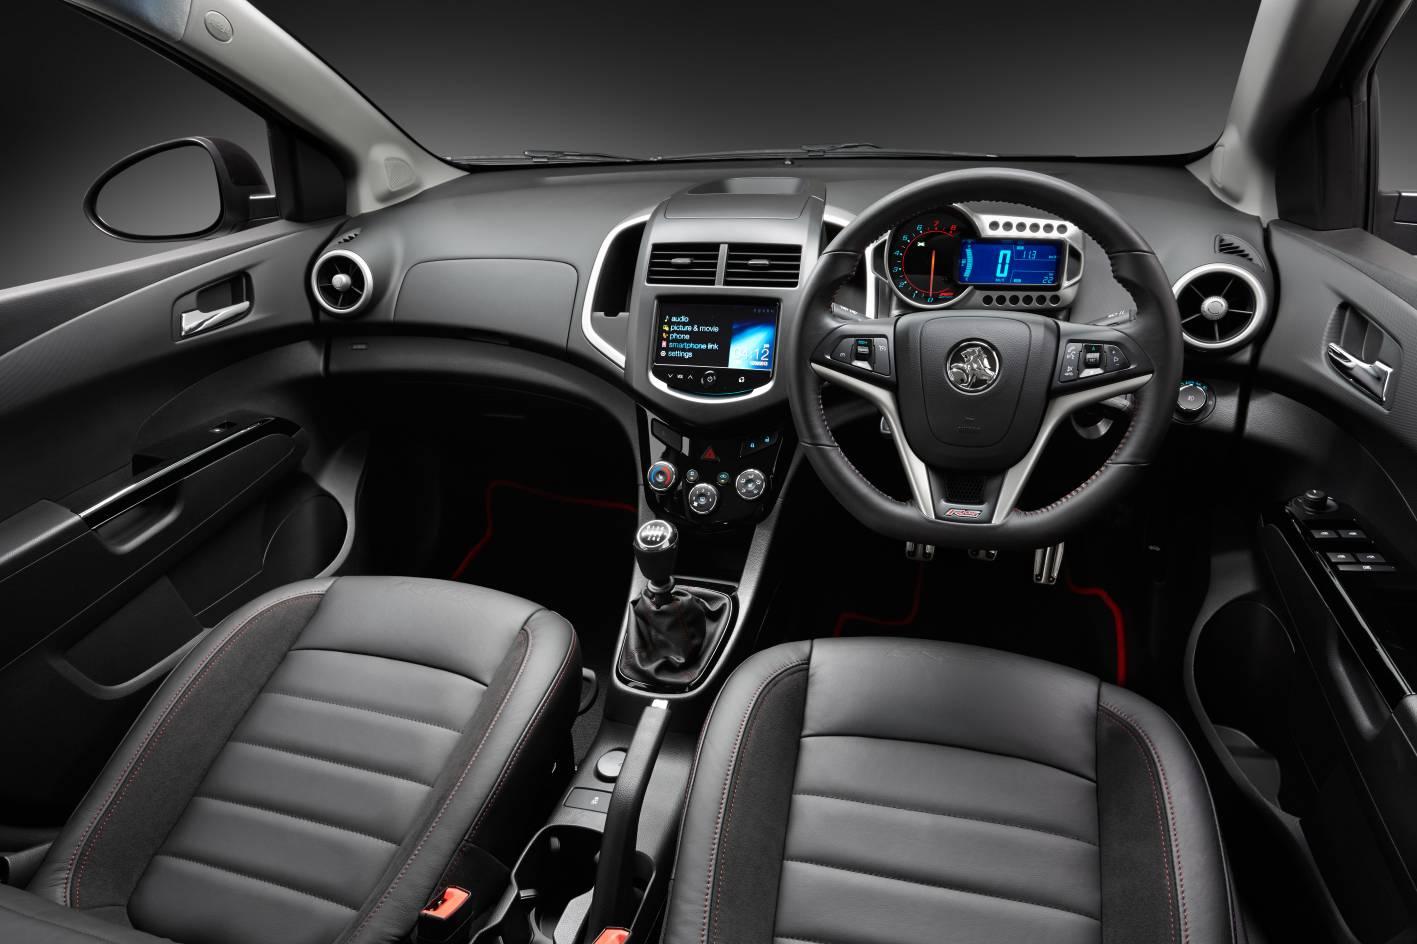 2014 Holden Barina Rs Interior